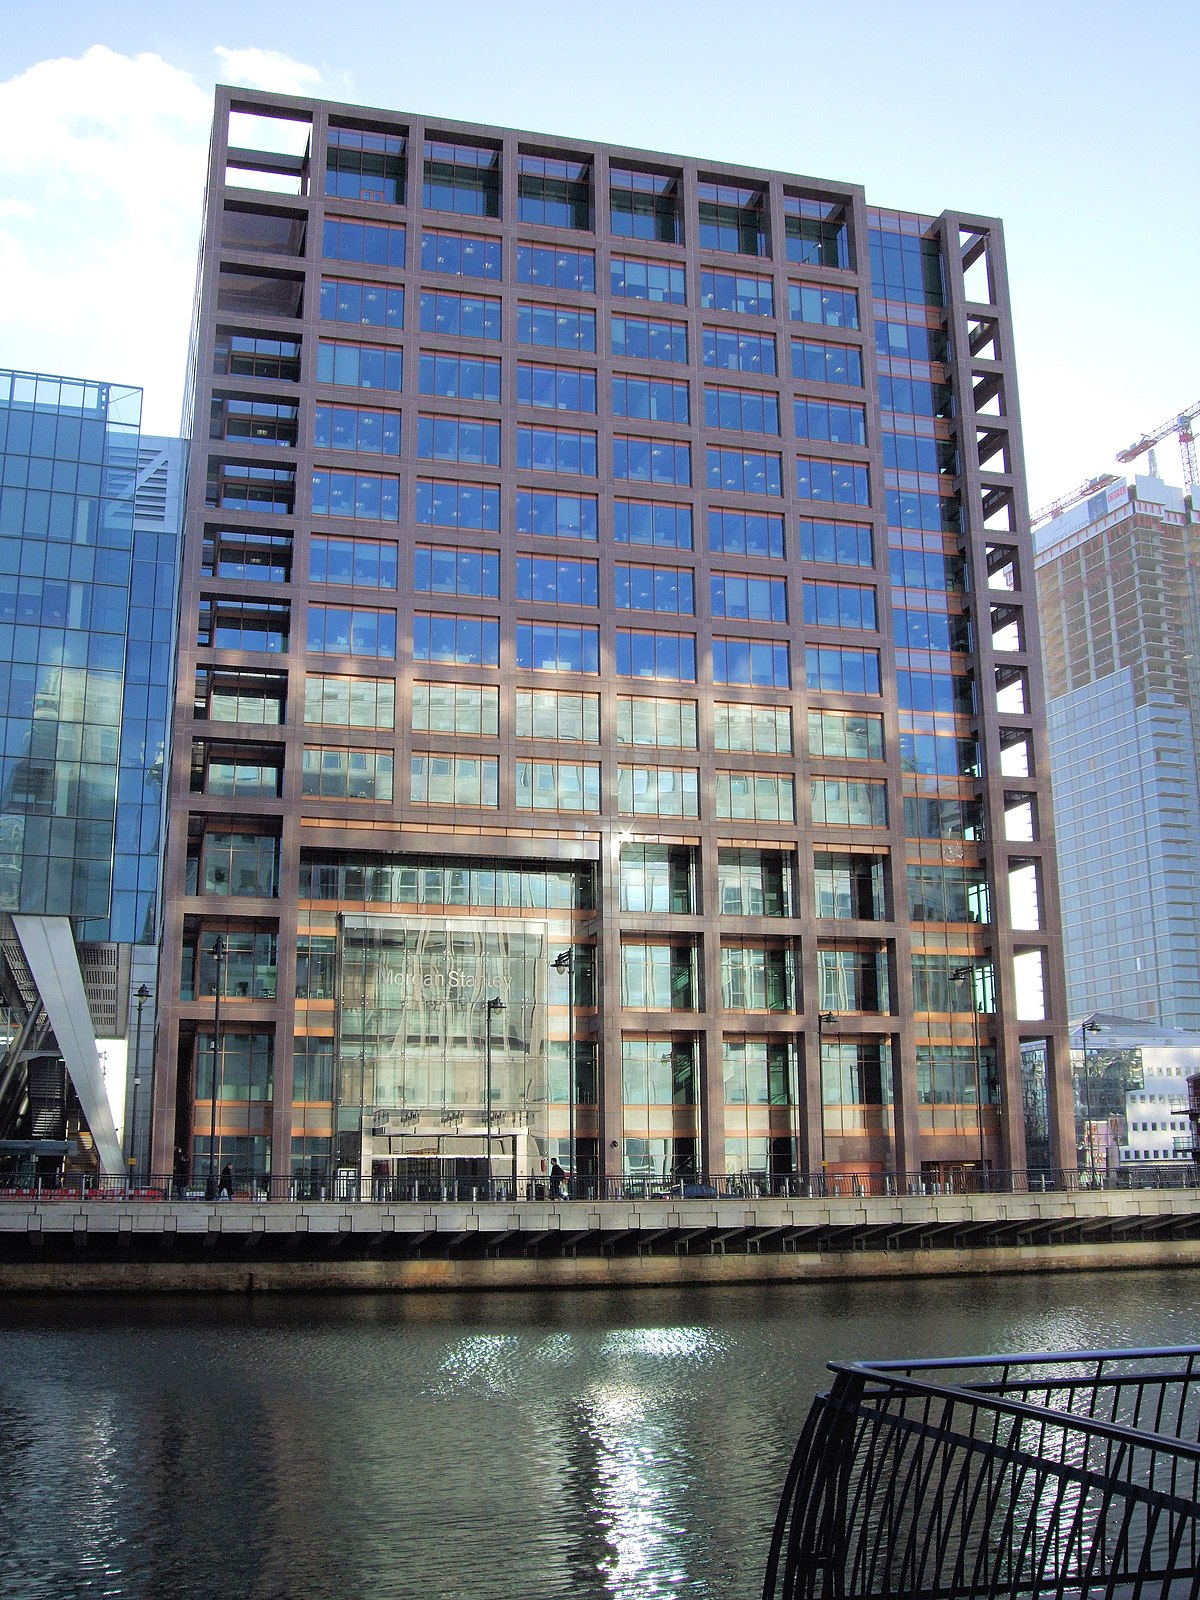 20 Bank Street (London) - Wikipedia